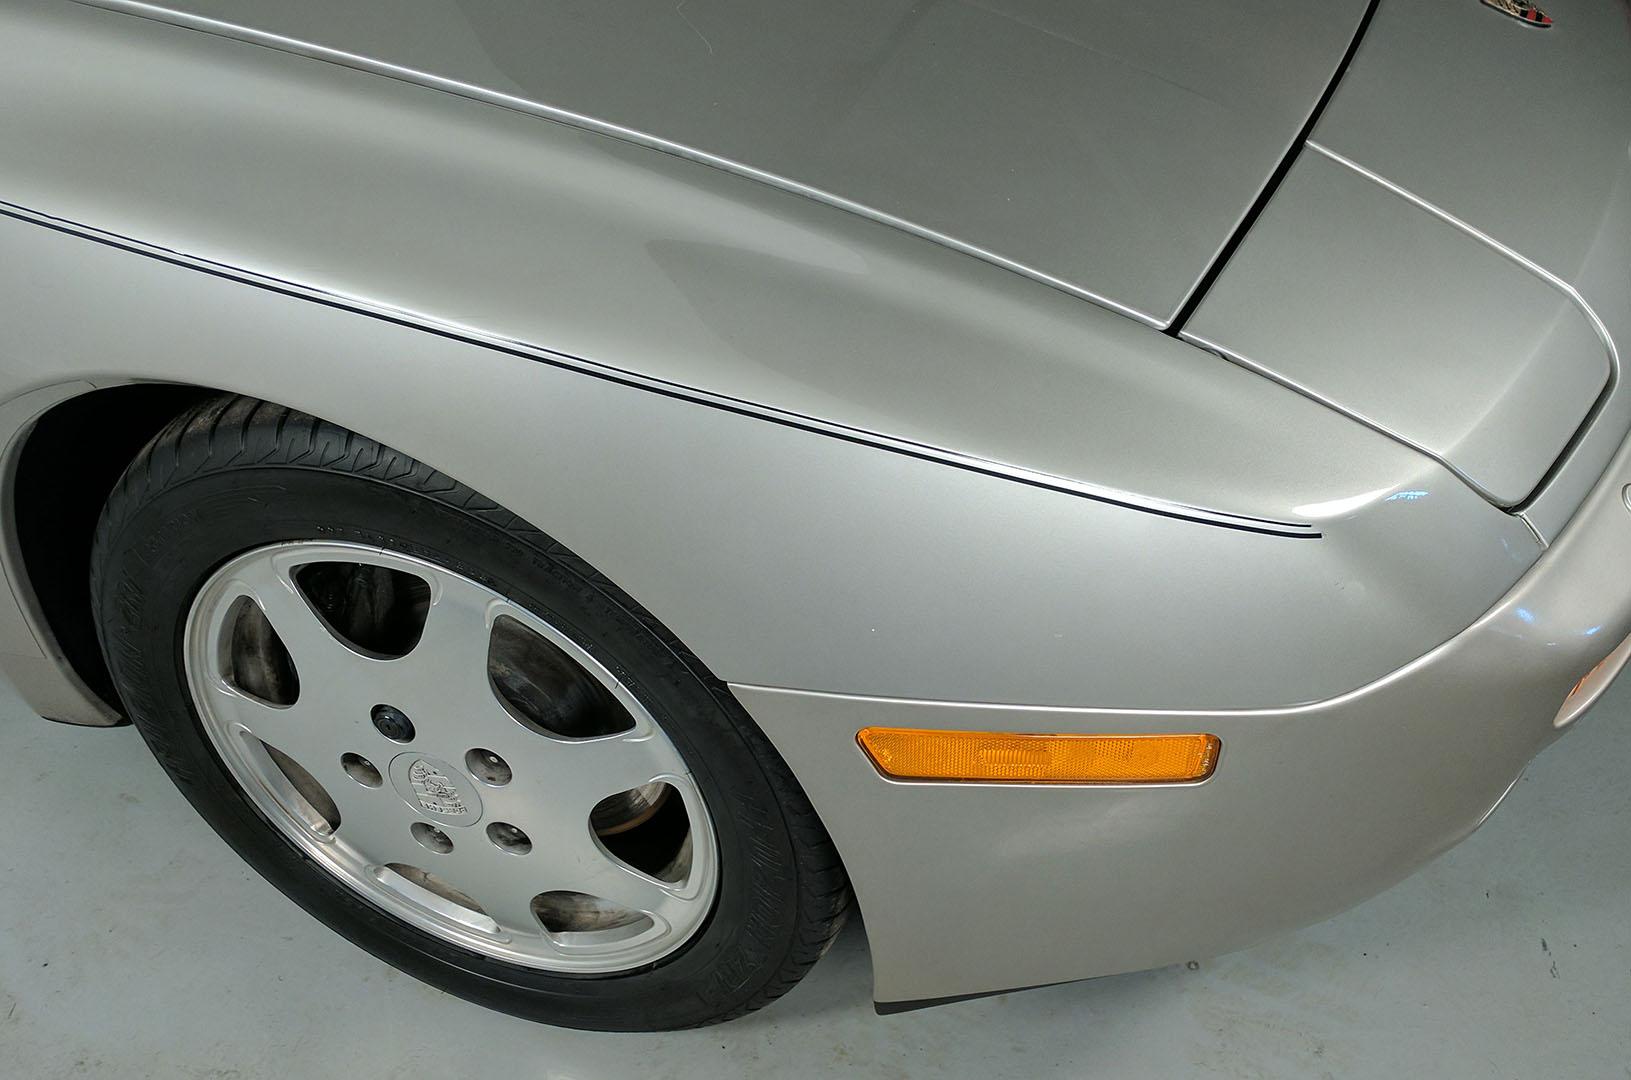 1989D_Porsche_944_Turbo_Silver_008.jpg